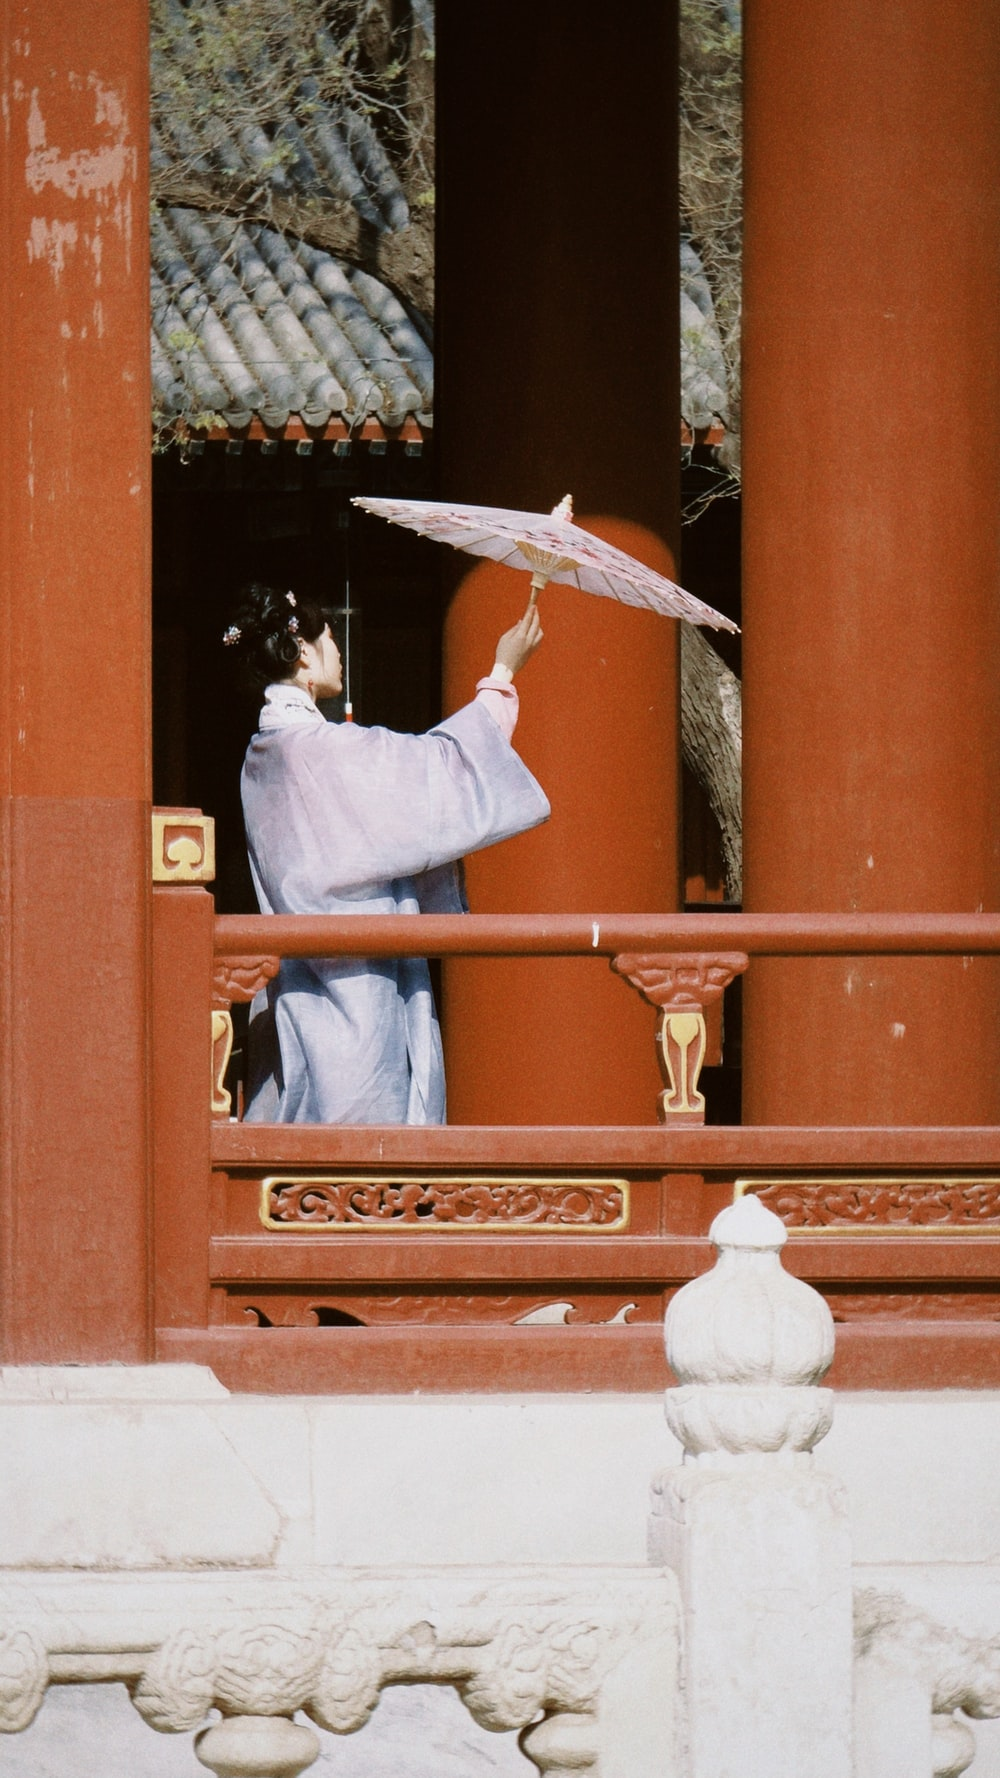 man in white thobe holding umbrella